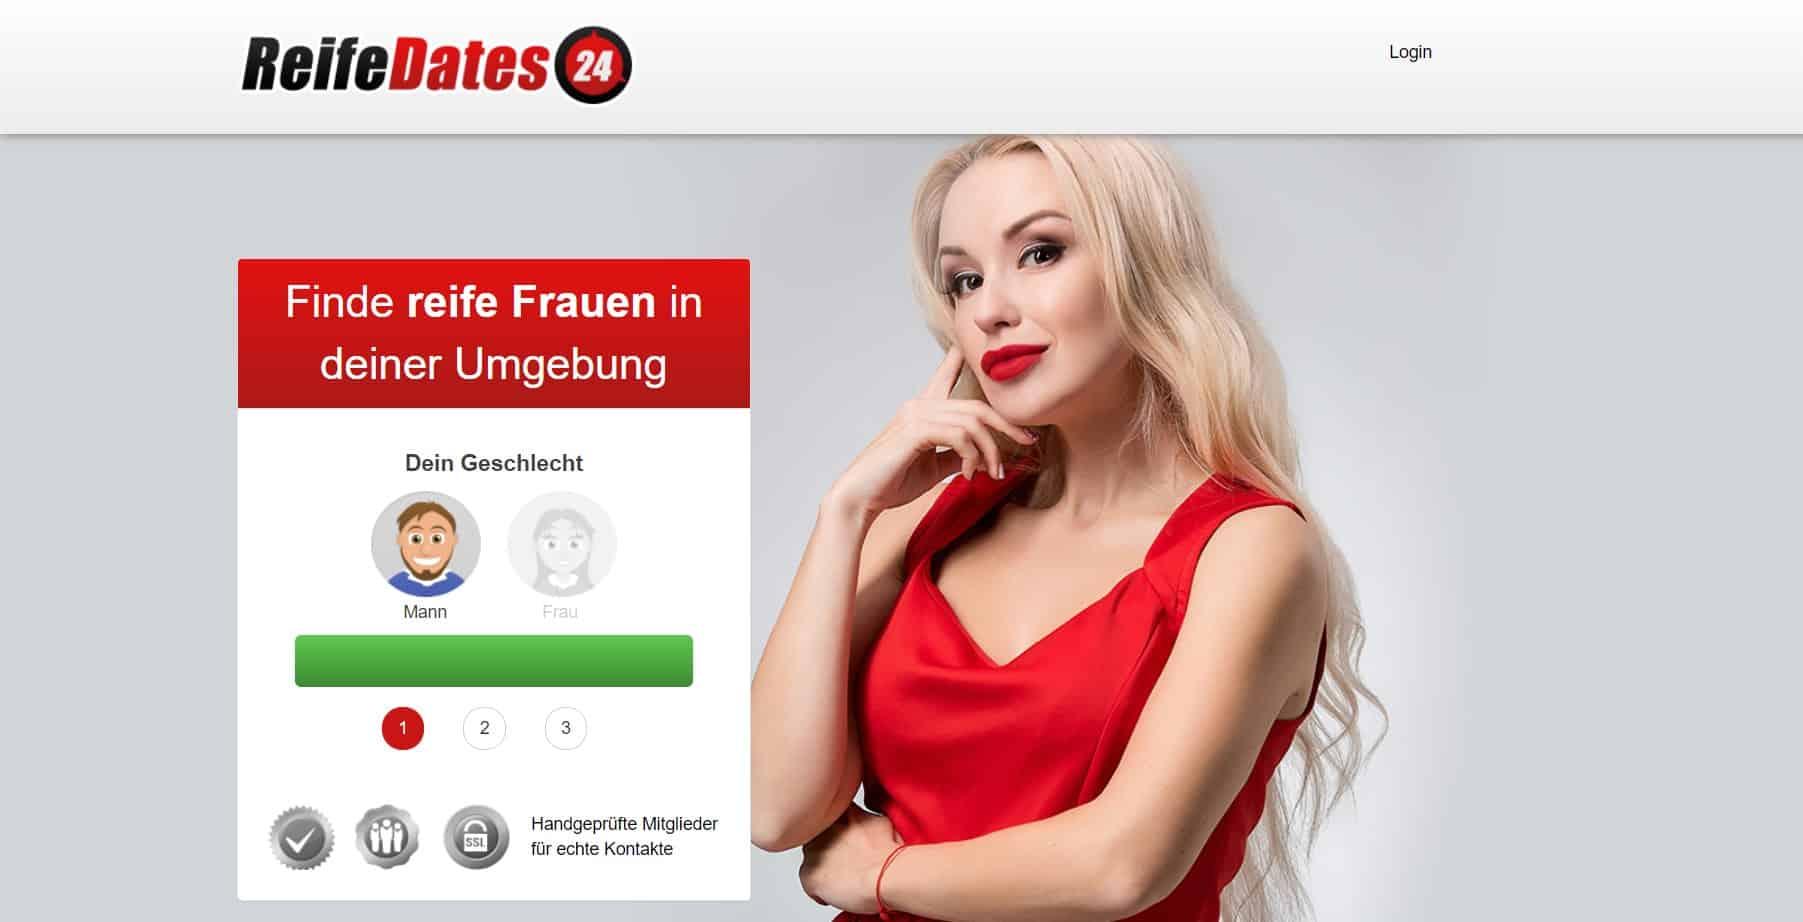 Testbericht: ReifeDates24.com Abzocke